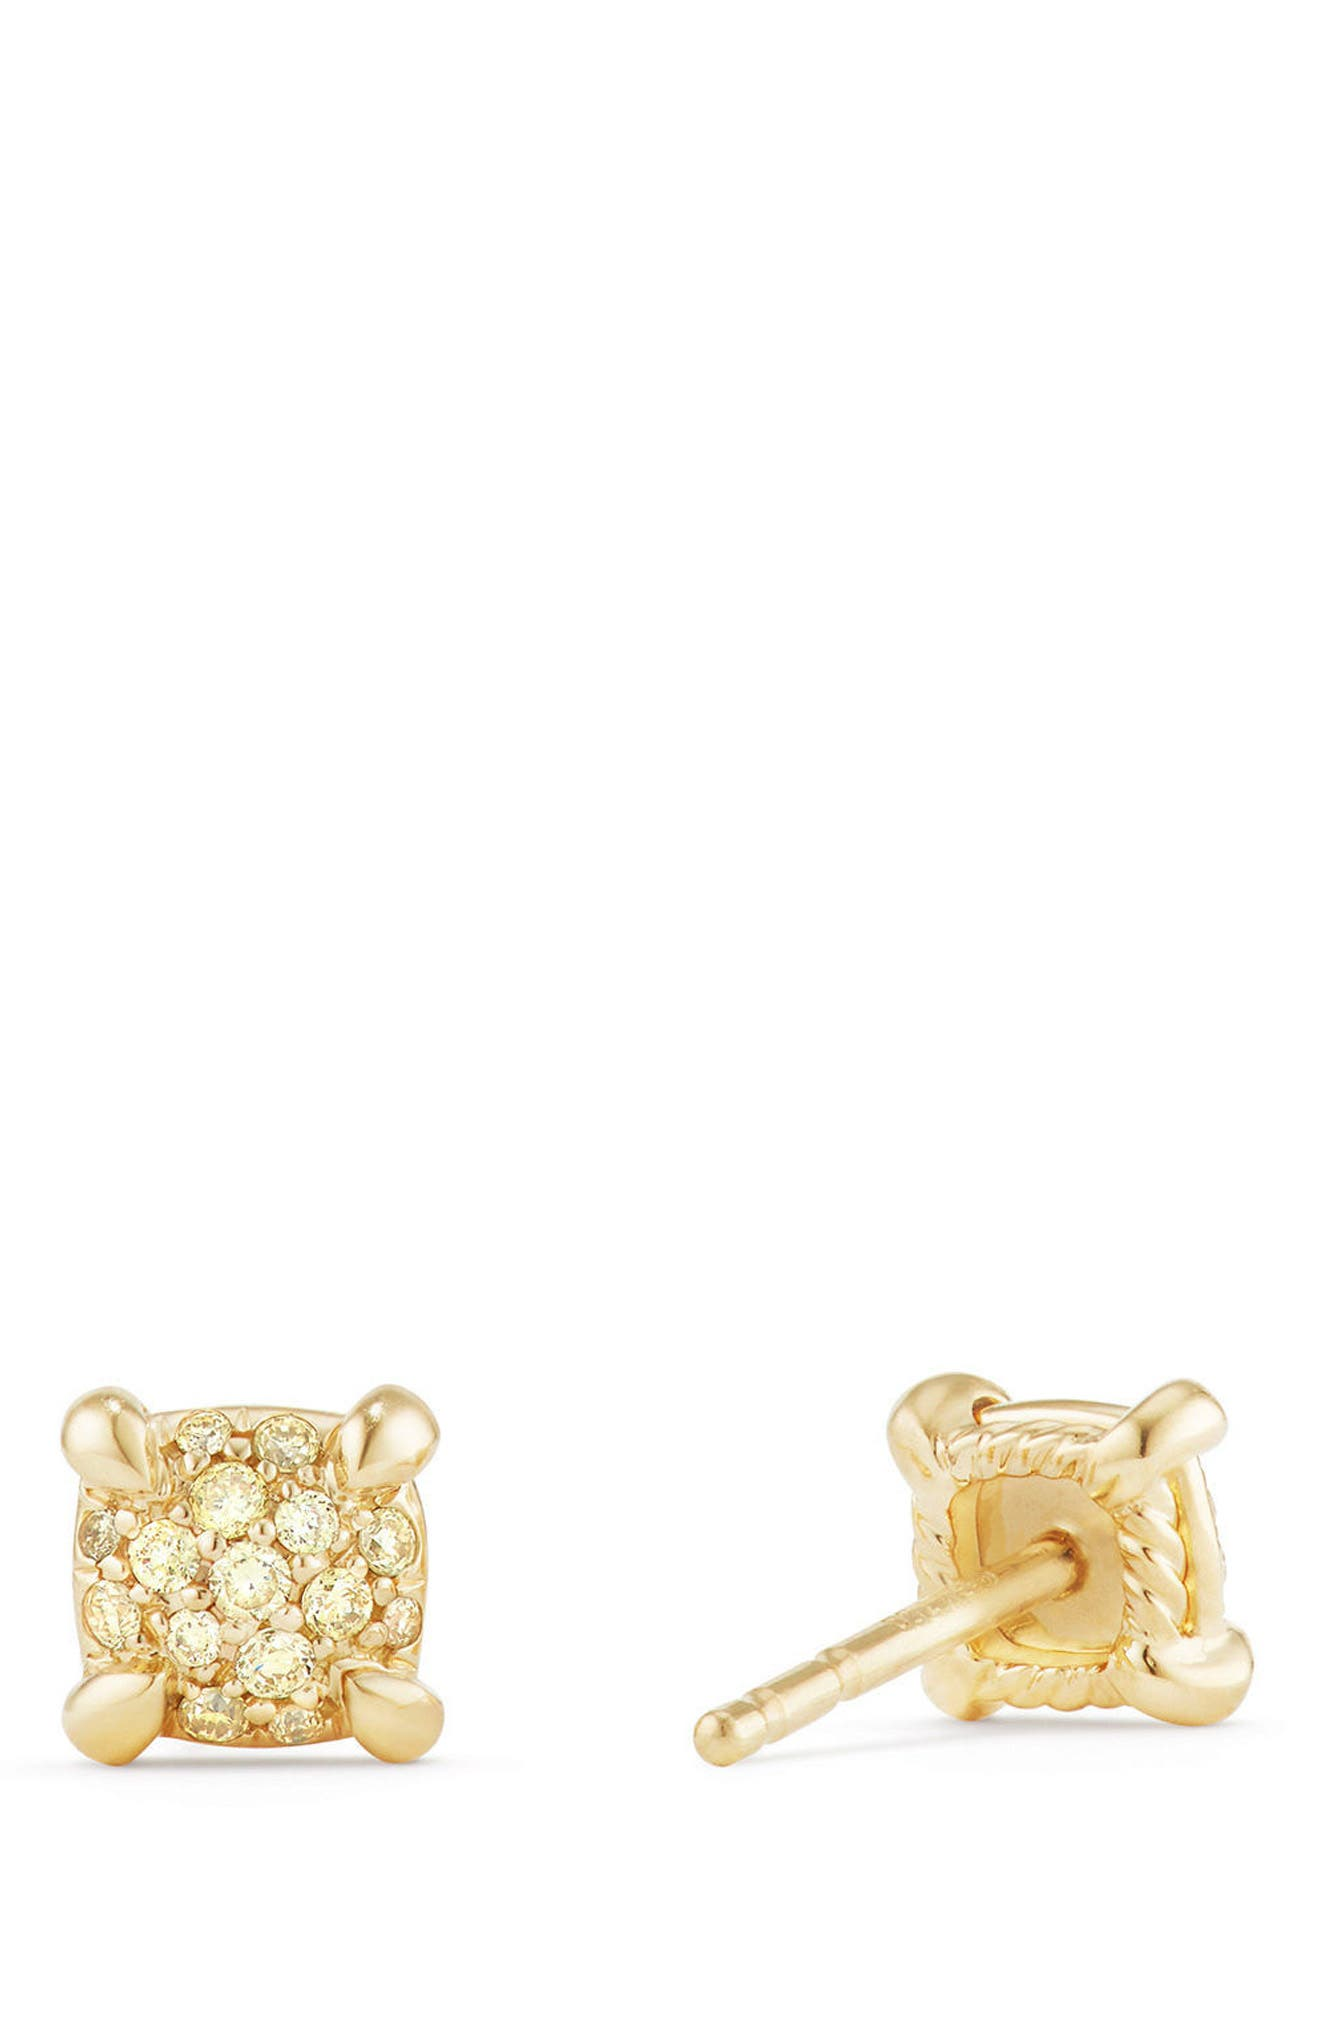 Châtelaine Stud Earrings with Diamonds,                             Alternate thumbnail 2, color,                             Yellow Diamond